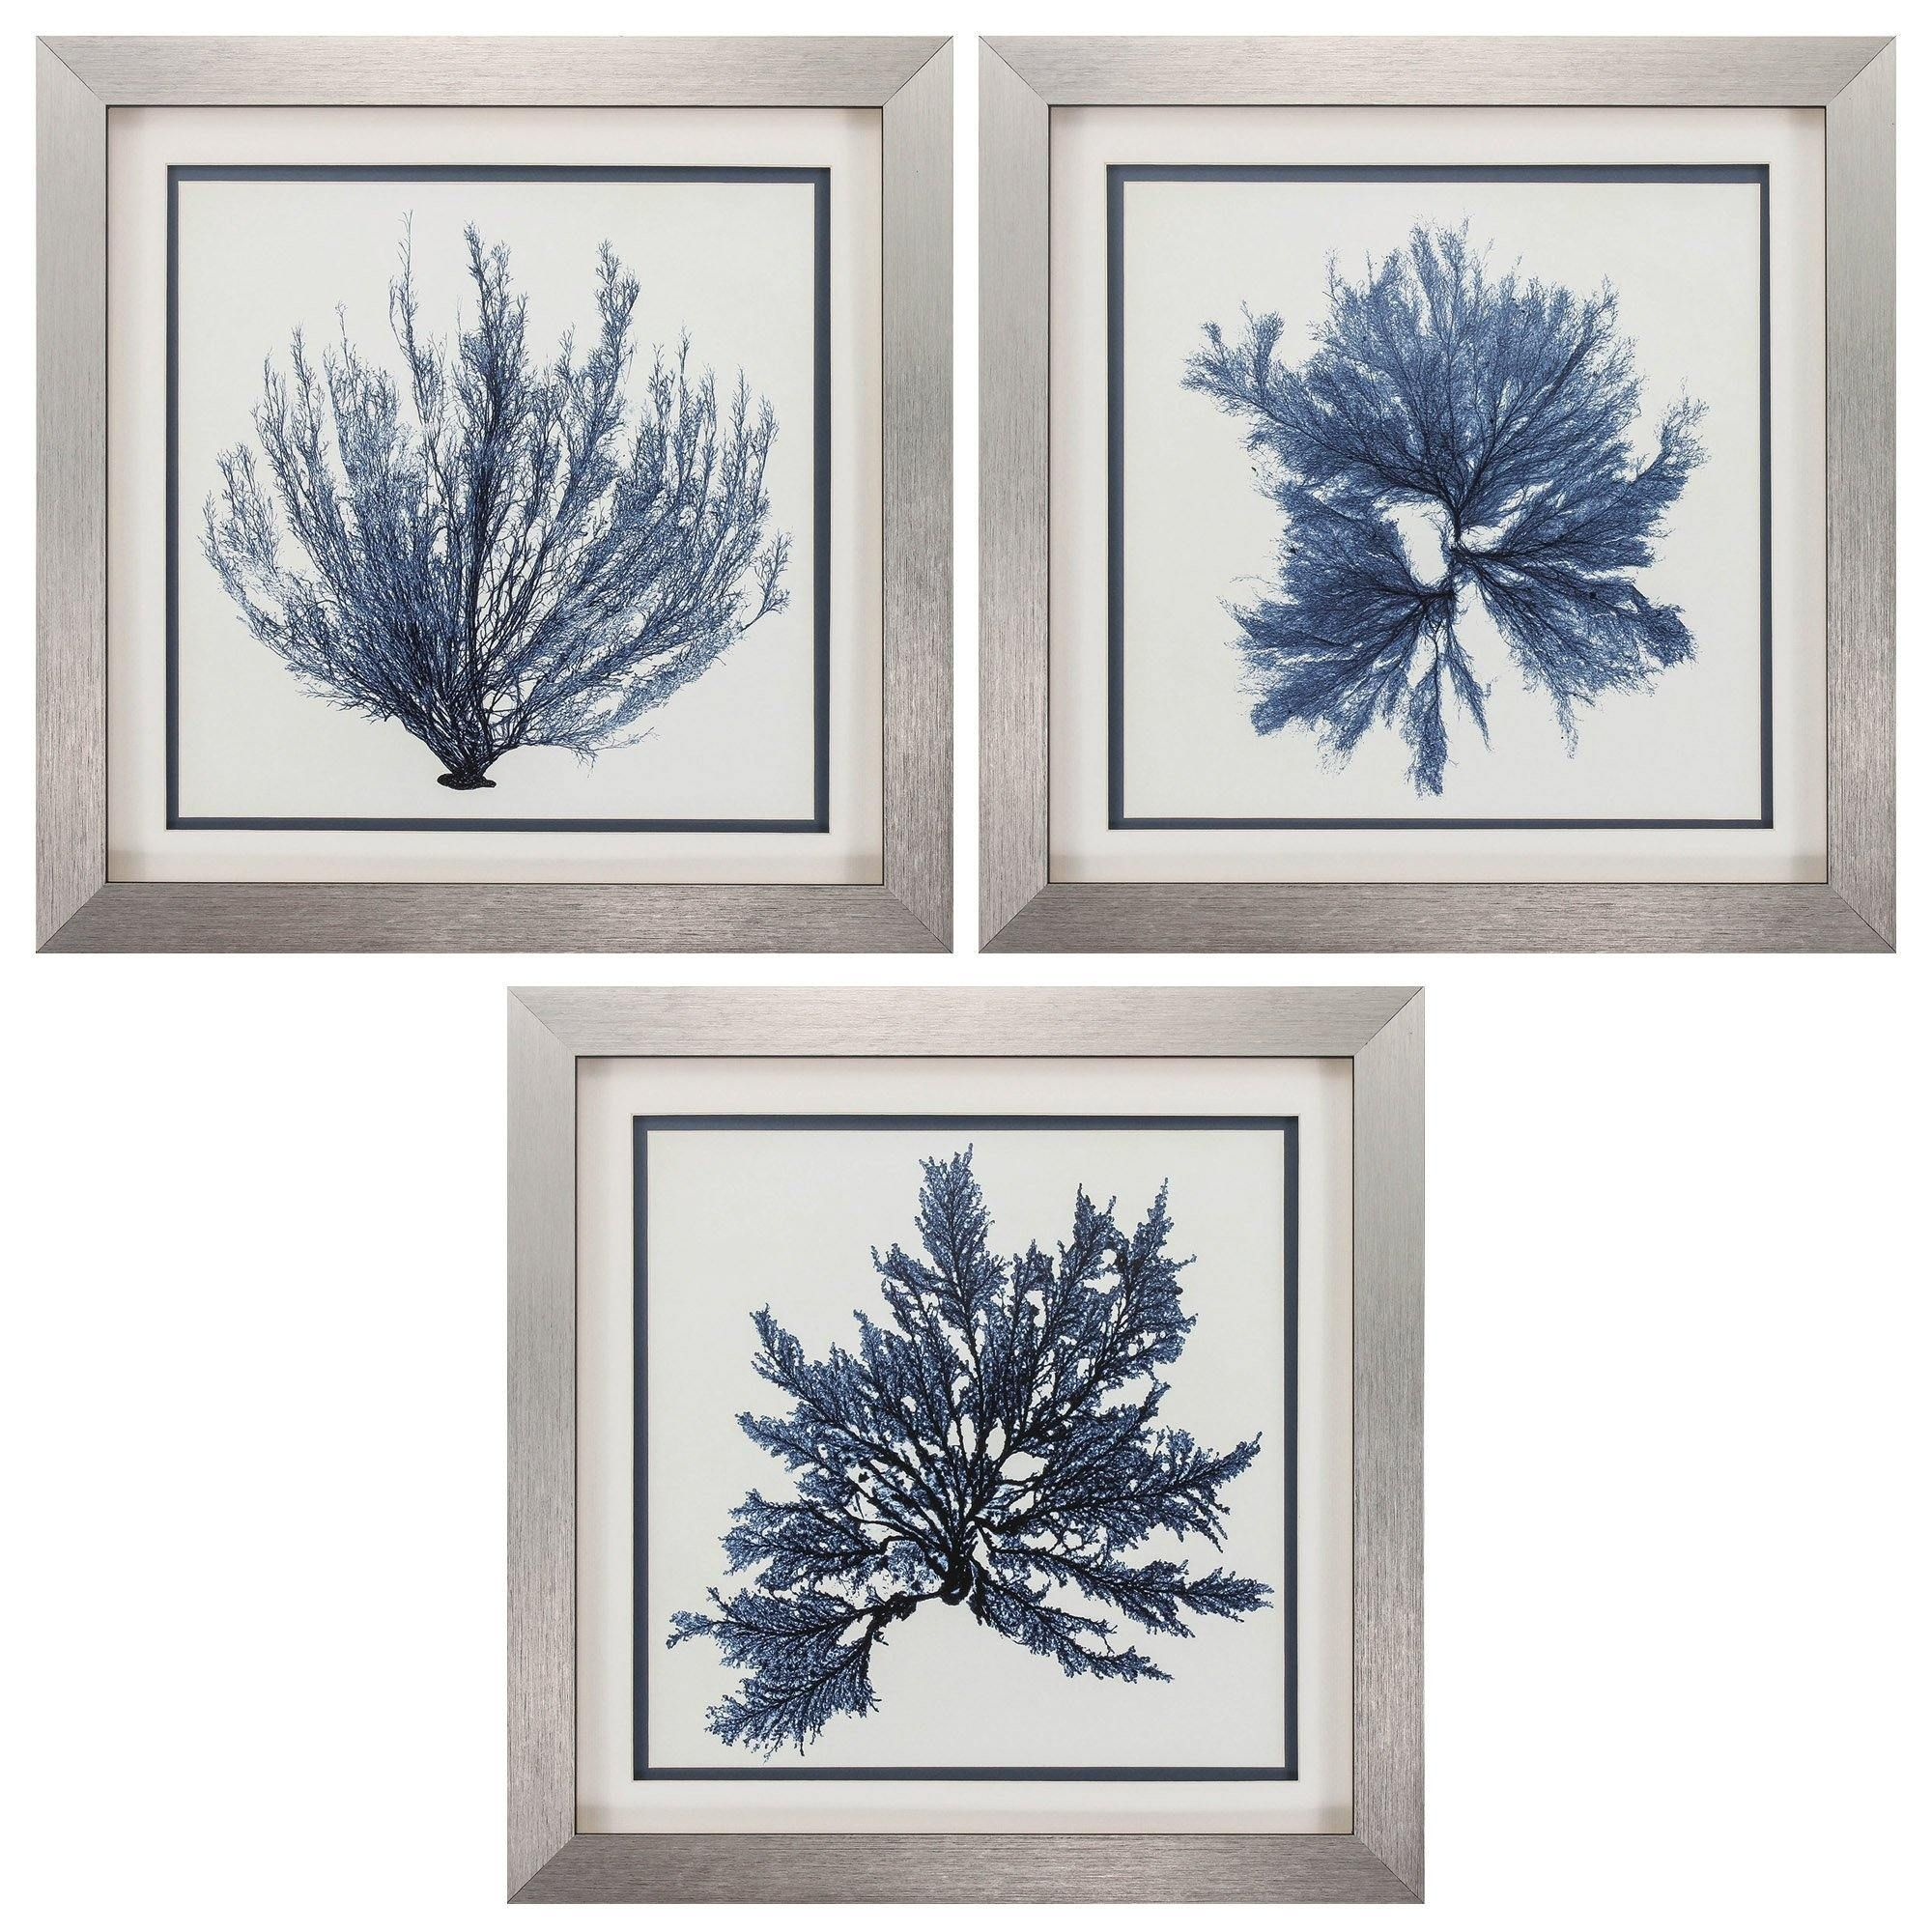 22 X 22 Silver Frame Coastal Seaweed Set Of 3 In 2021 Gallery Frame Set Beach Inspired Decor Blue Wall Art